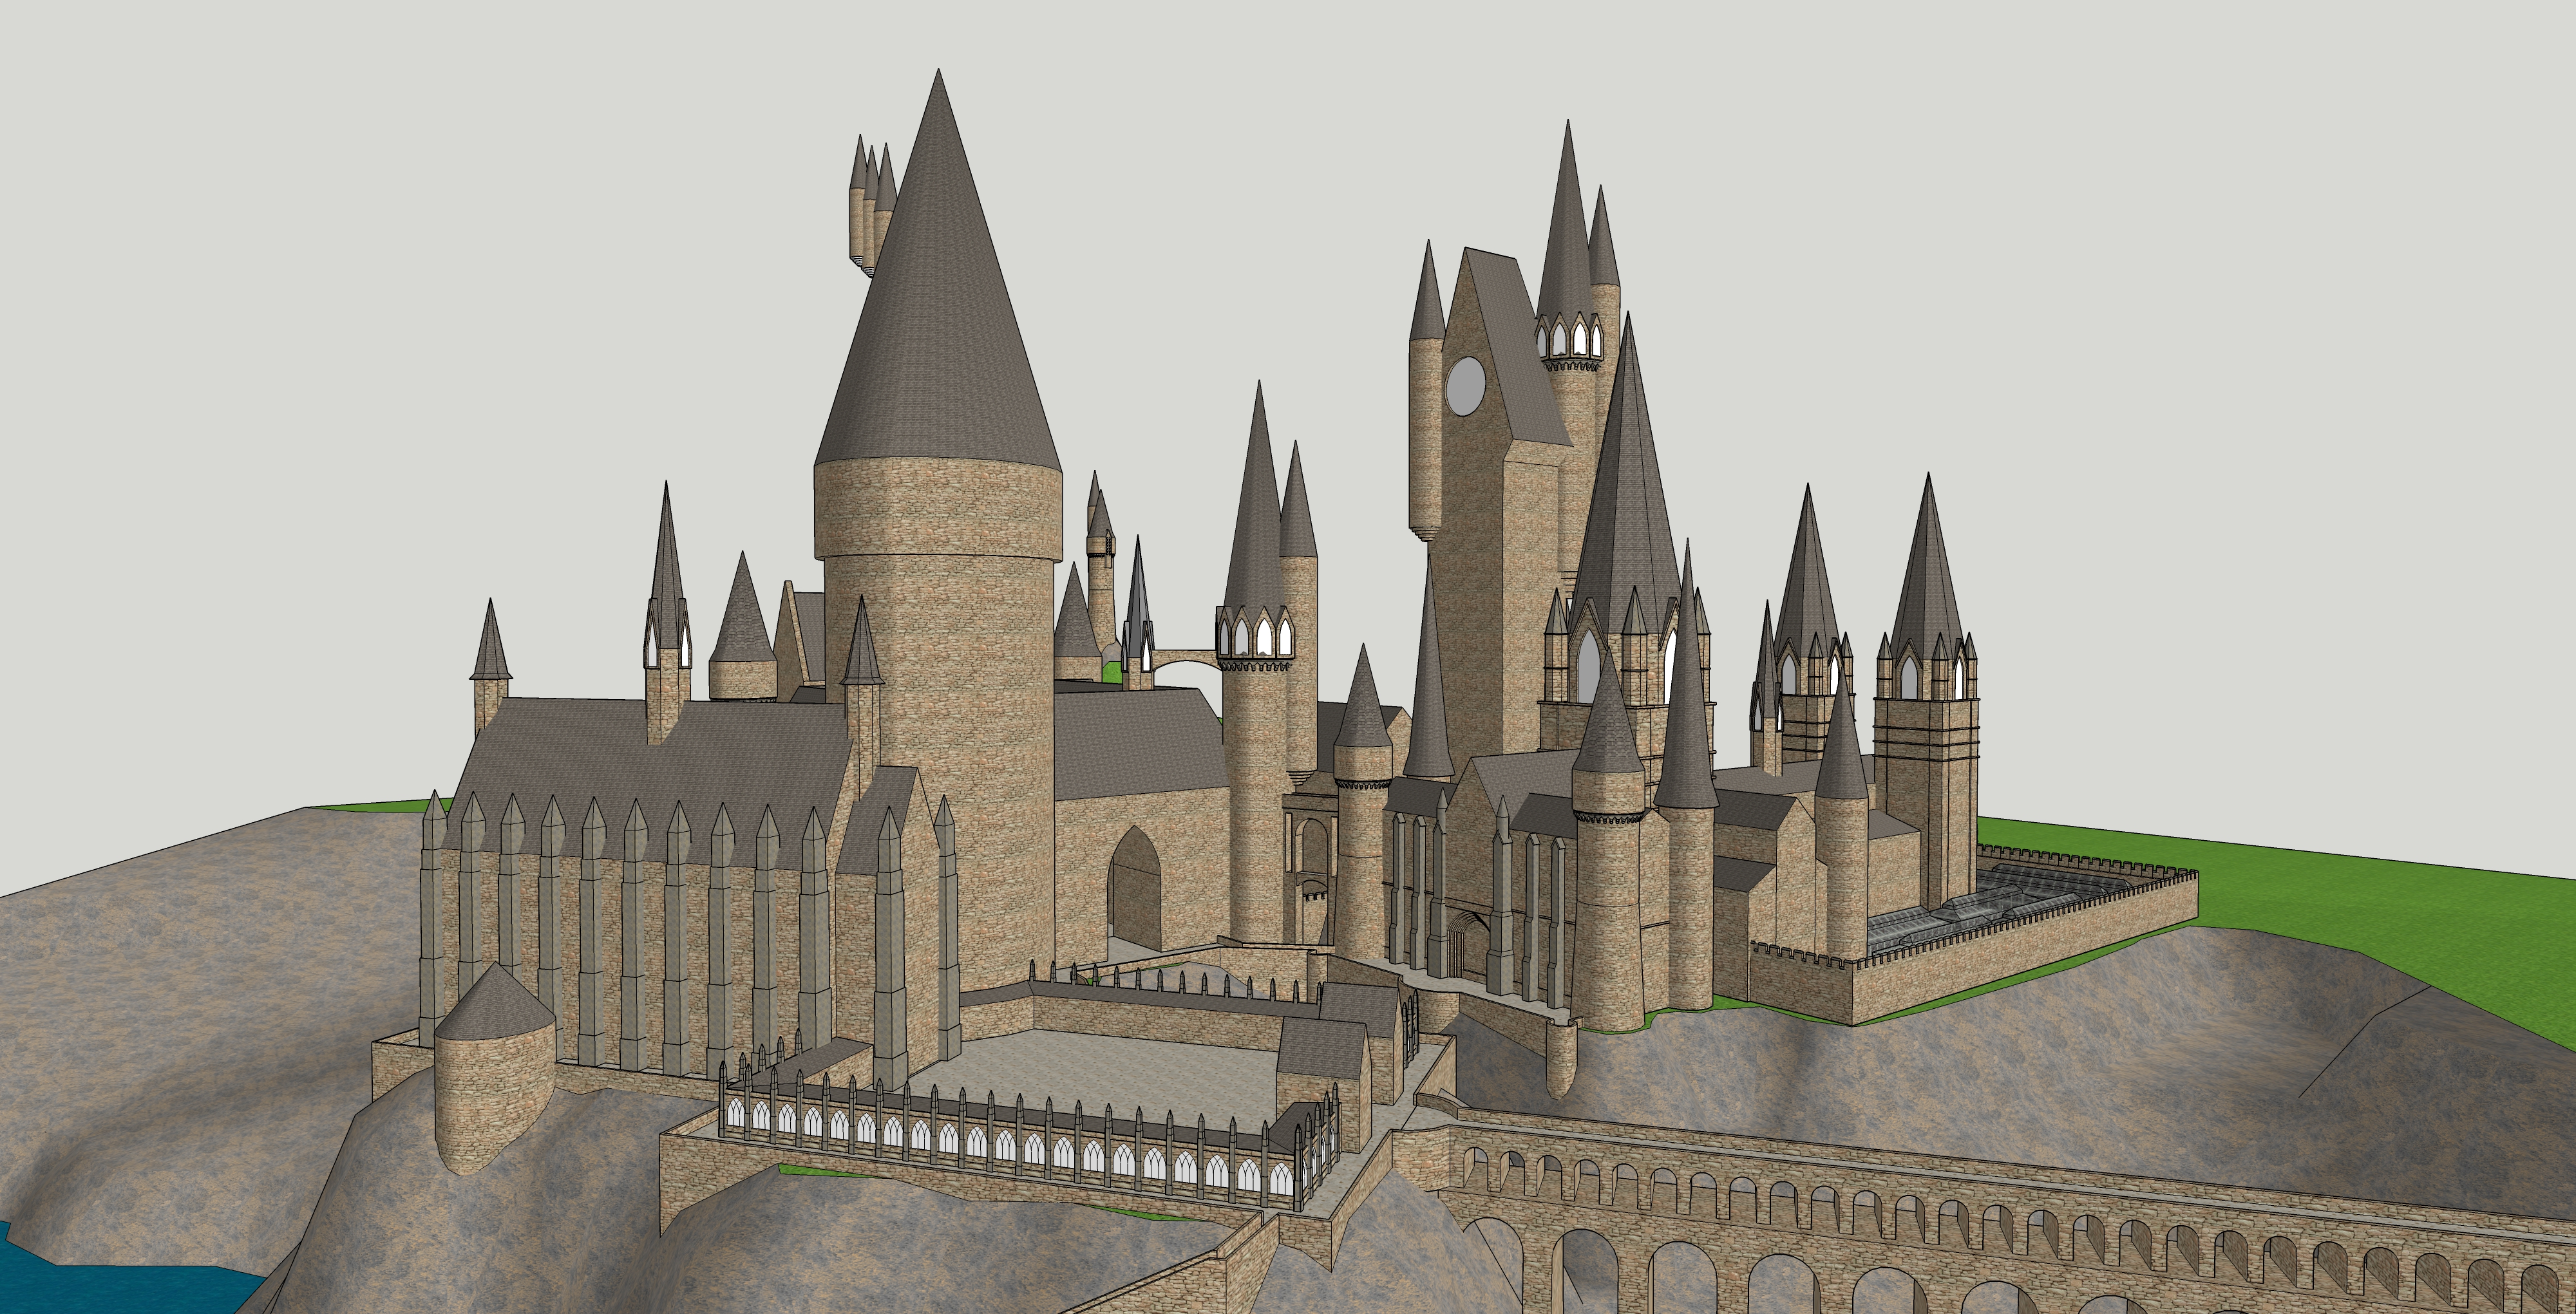 Hogwarts from Harry Potter